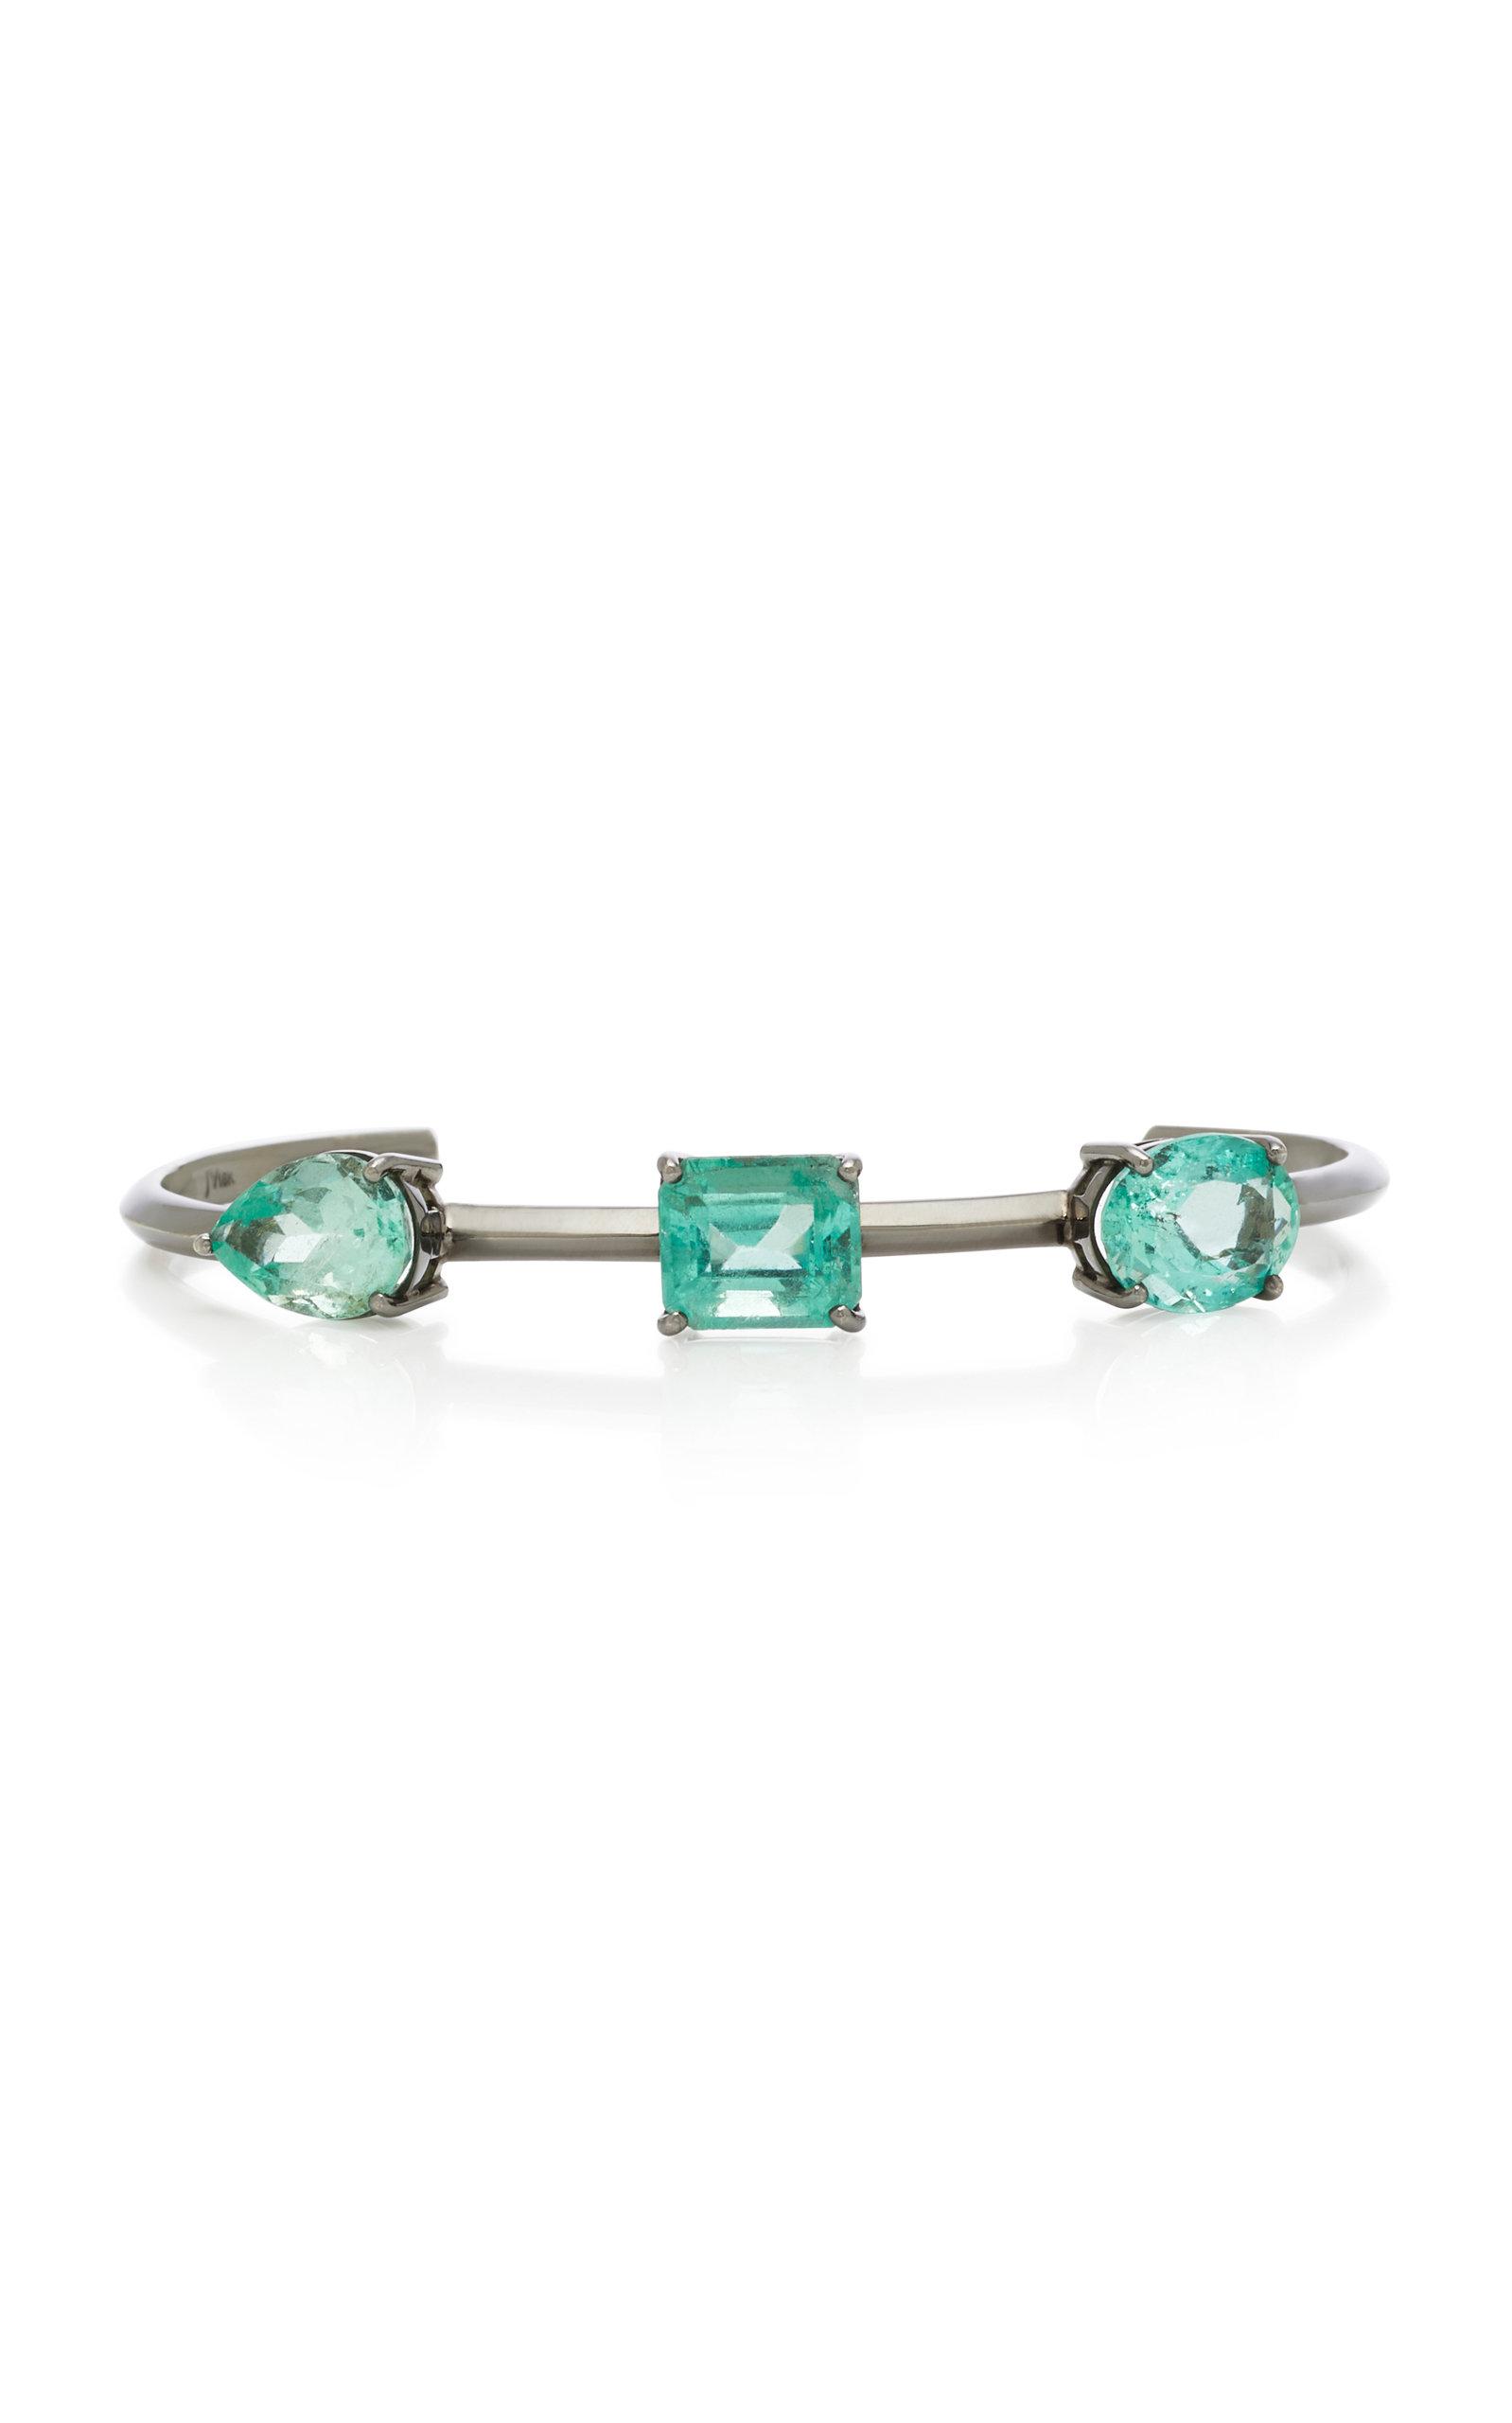 JACK VARTANIAN Rhodium-Plated 18K White Gold Emerald Bracelet in Green